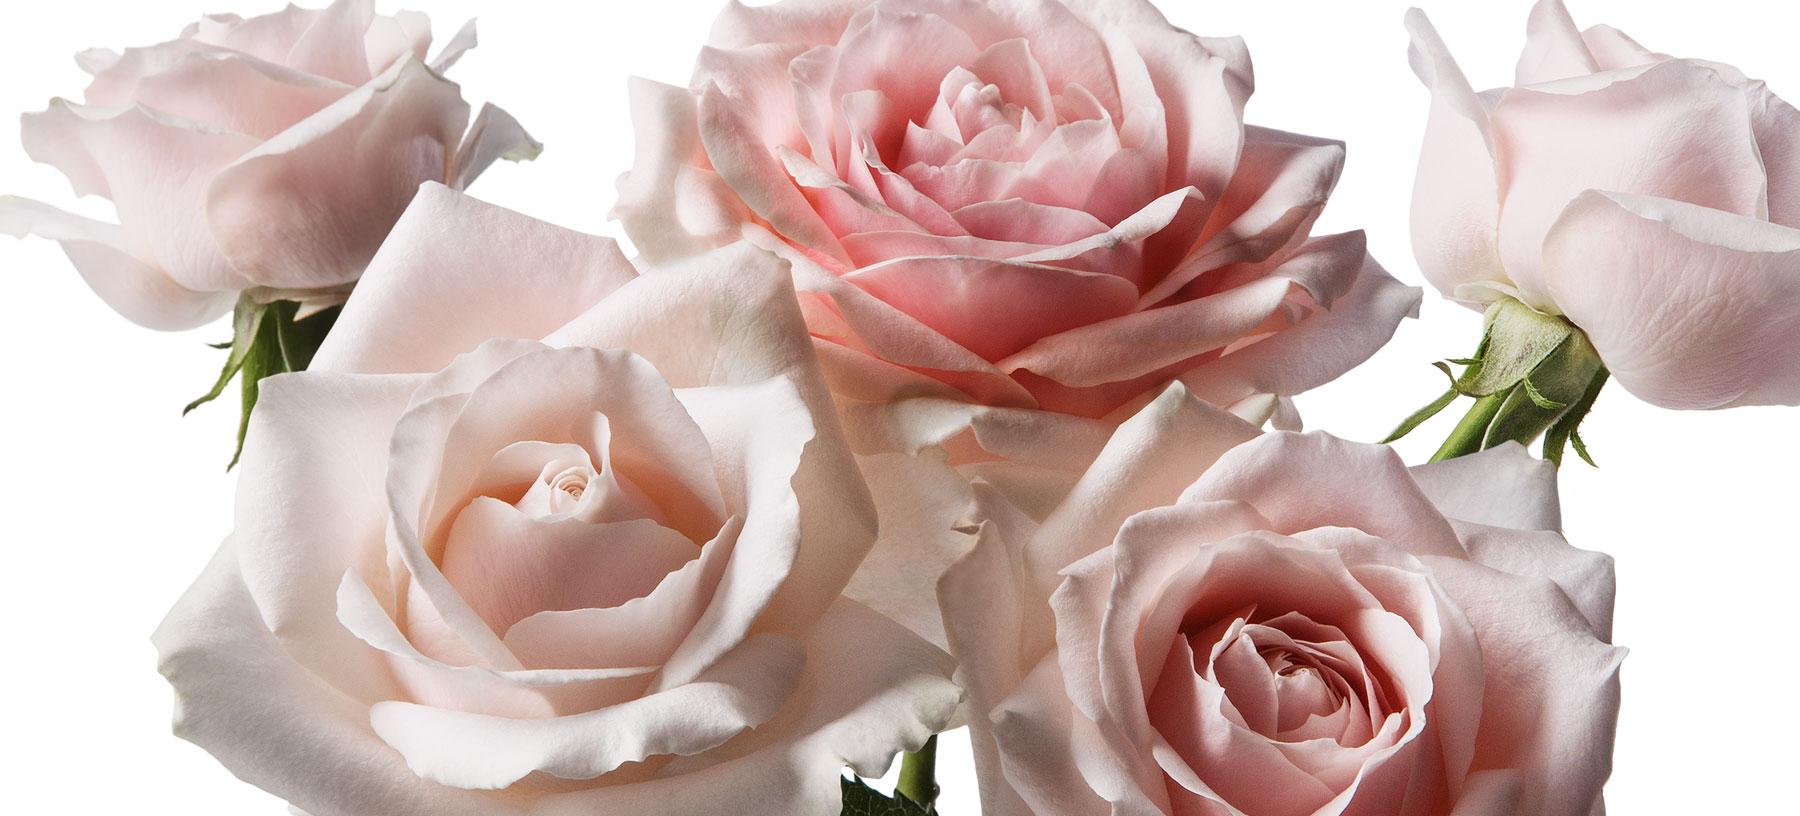 Michael Kors Mother's Day